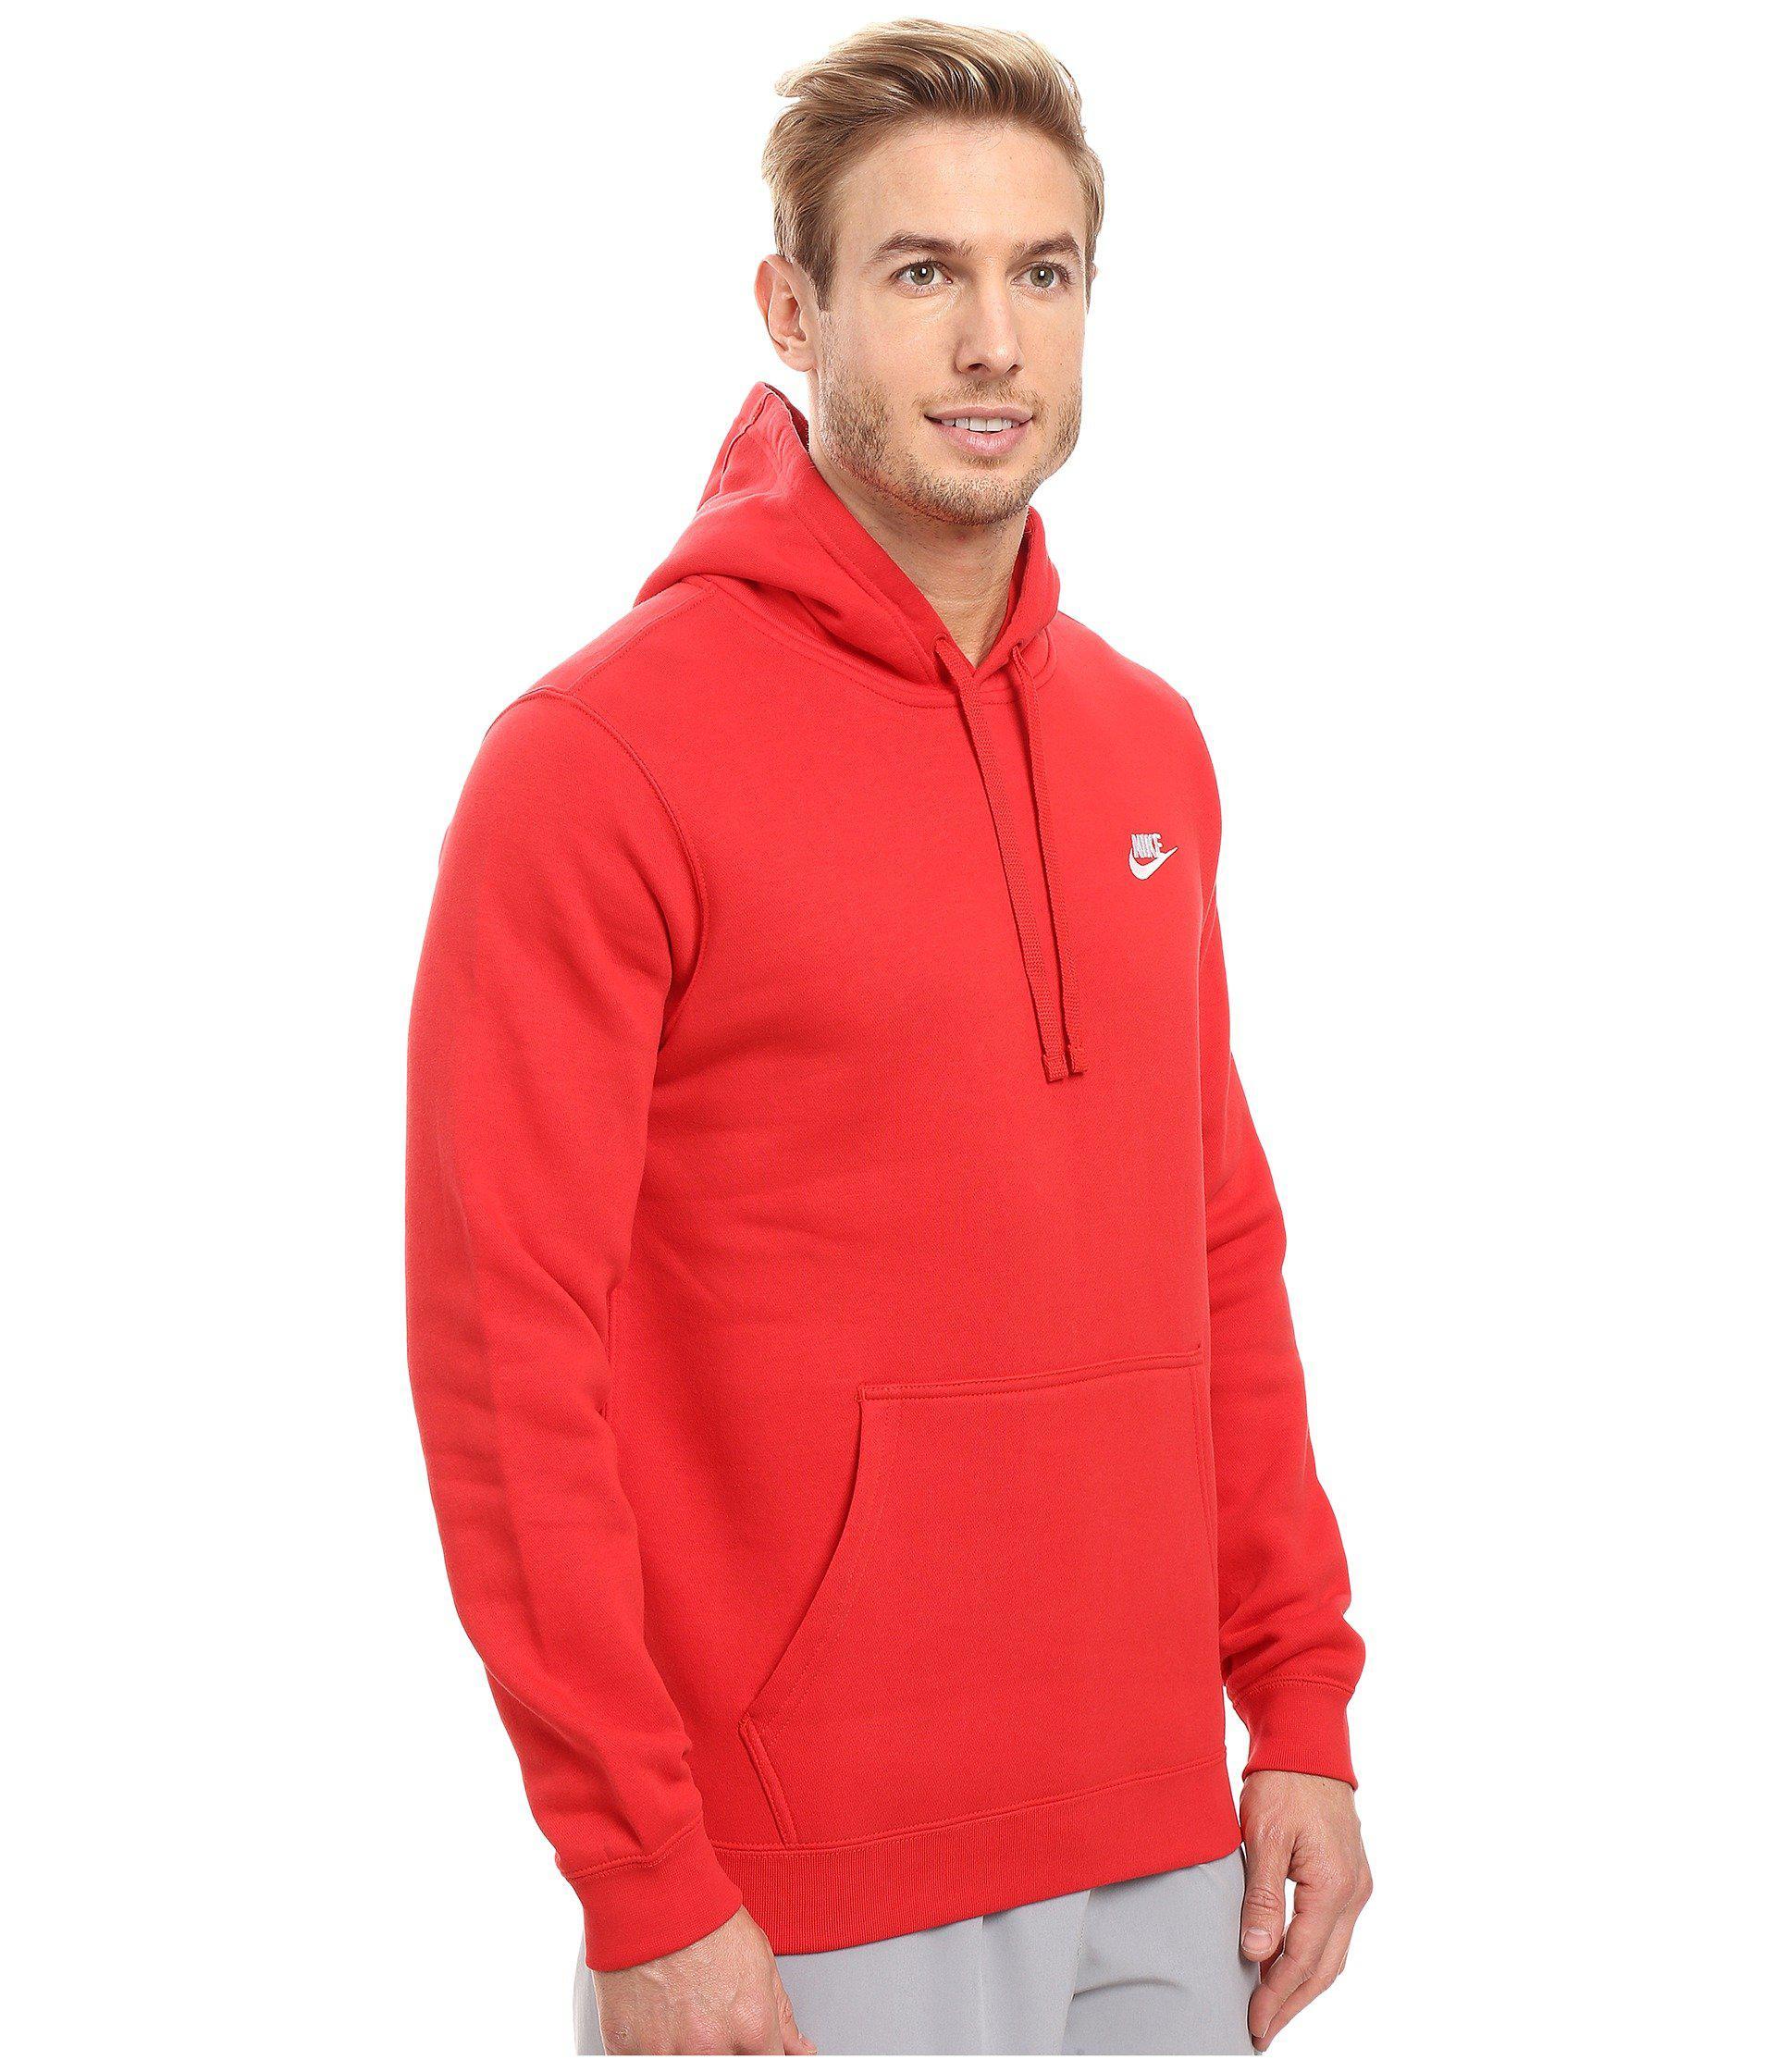 1668bc7c215 Club Fleece Pullover Nike Men s Hoodie Lyst blackblackwhite vz5TSwW